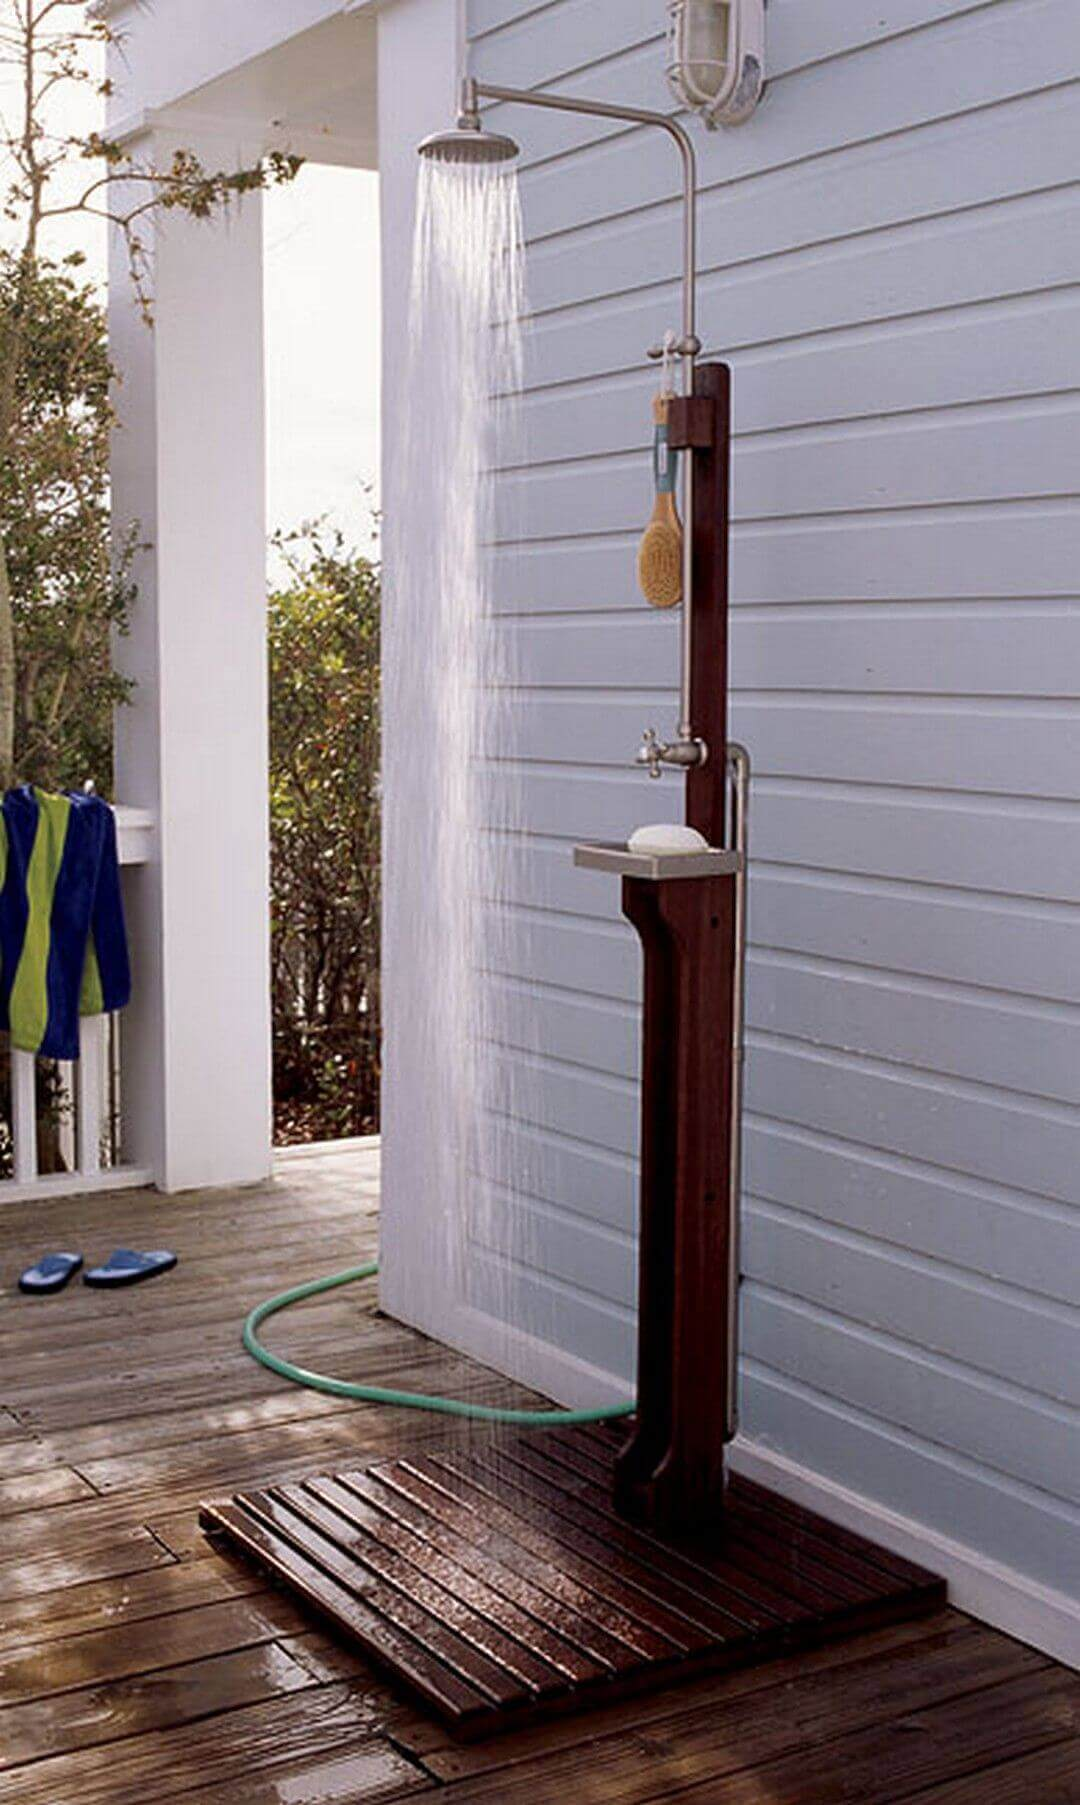 Simple Outdoor Shower Ideas Freestanding Shower Kits - Harptimes.com